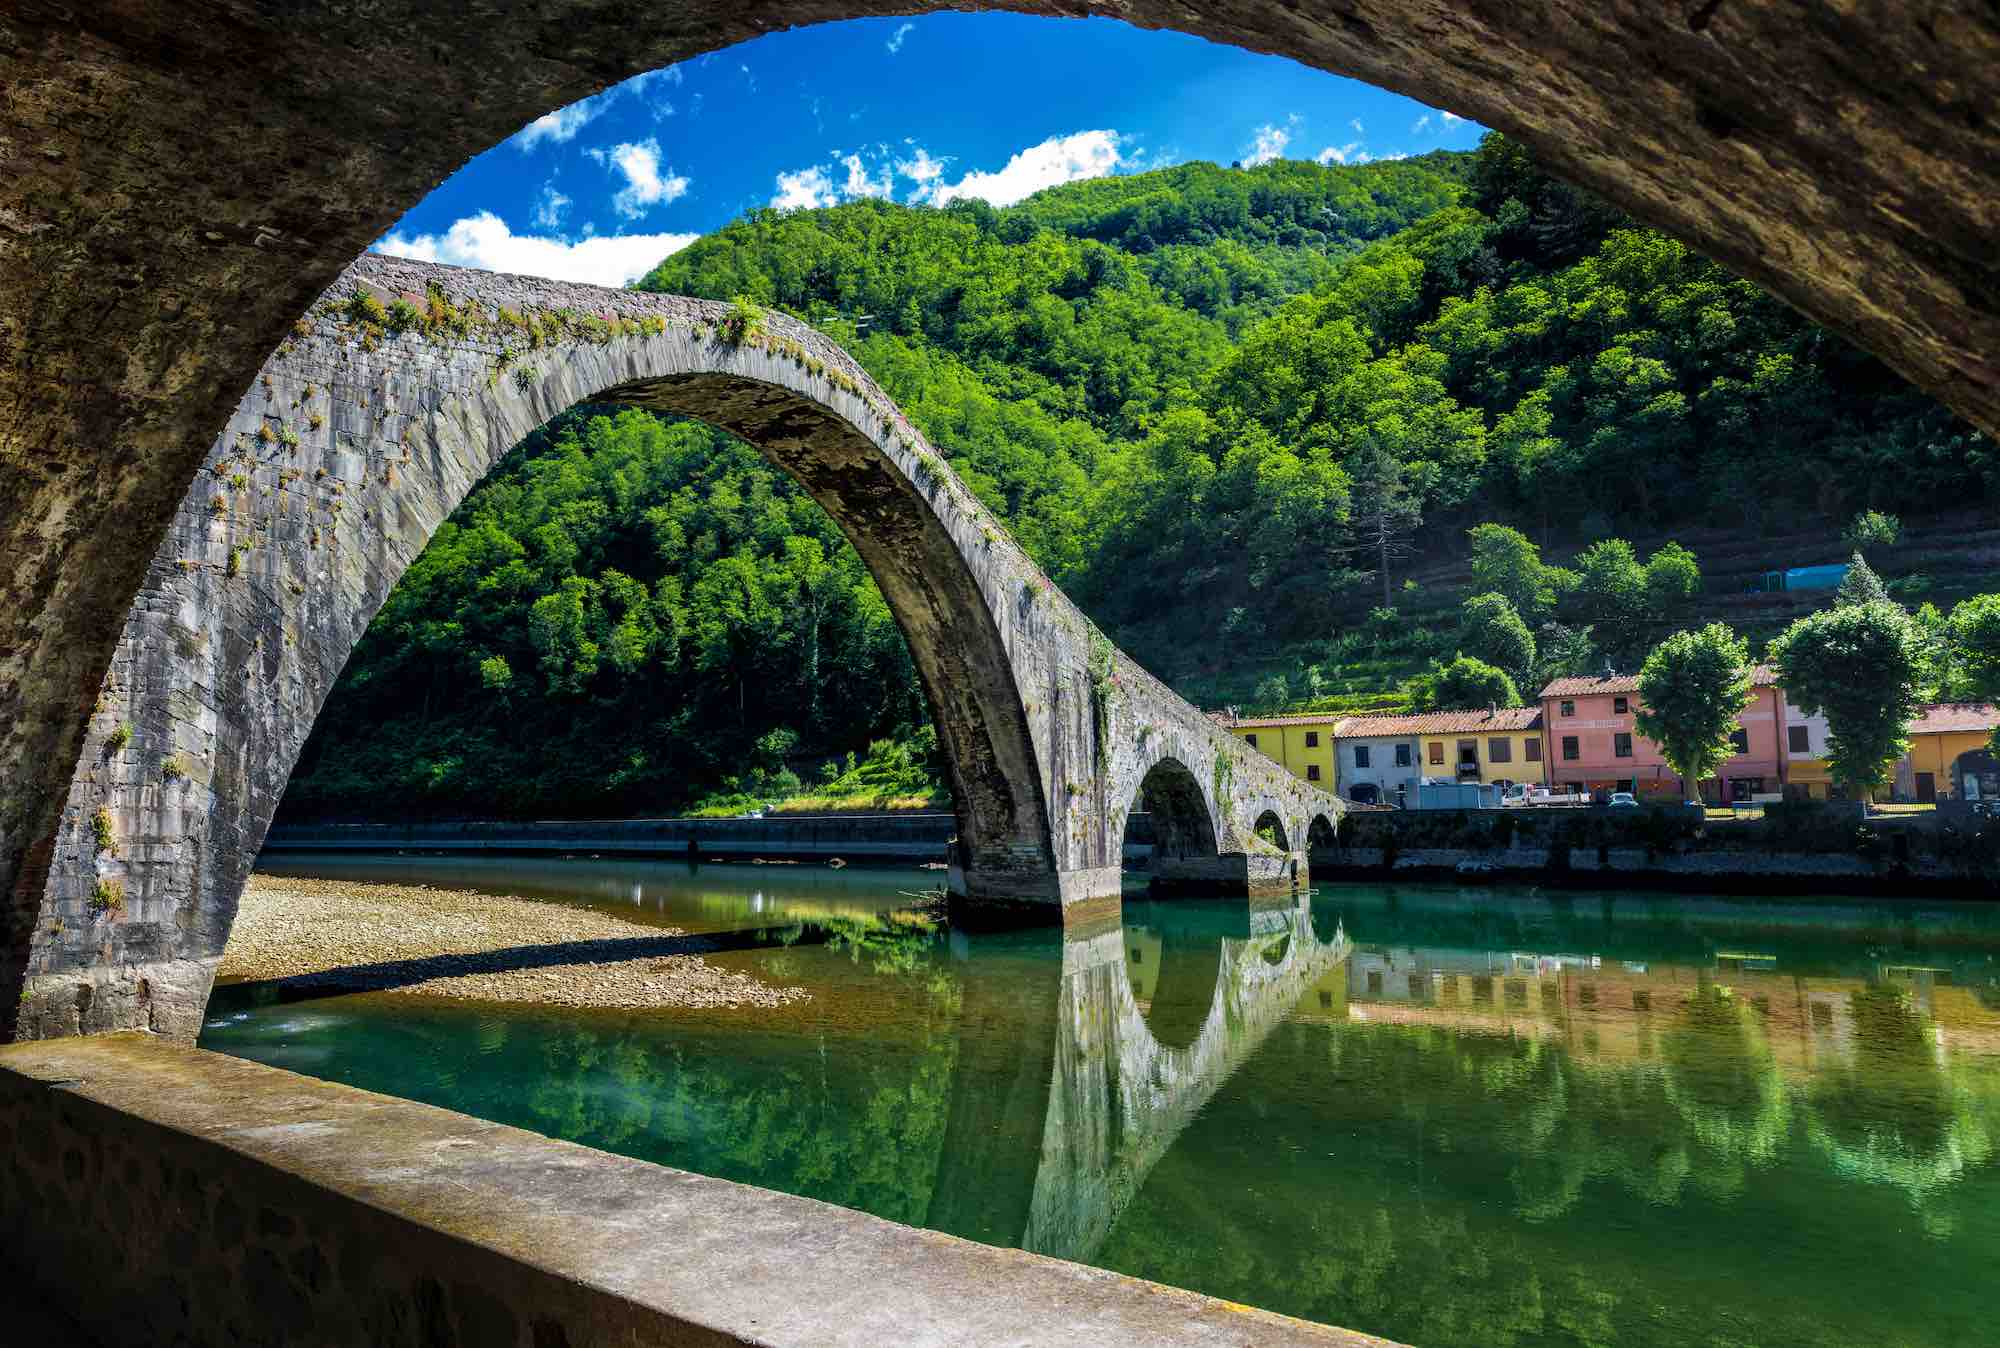 Ponte del Diavolo a Borgo a Mozzano in Garfagnana, zona della Toscana